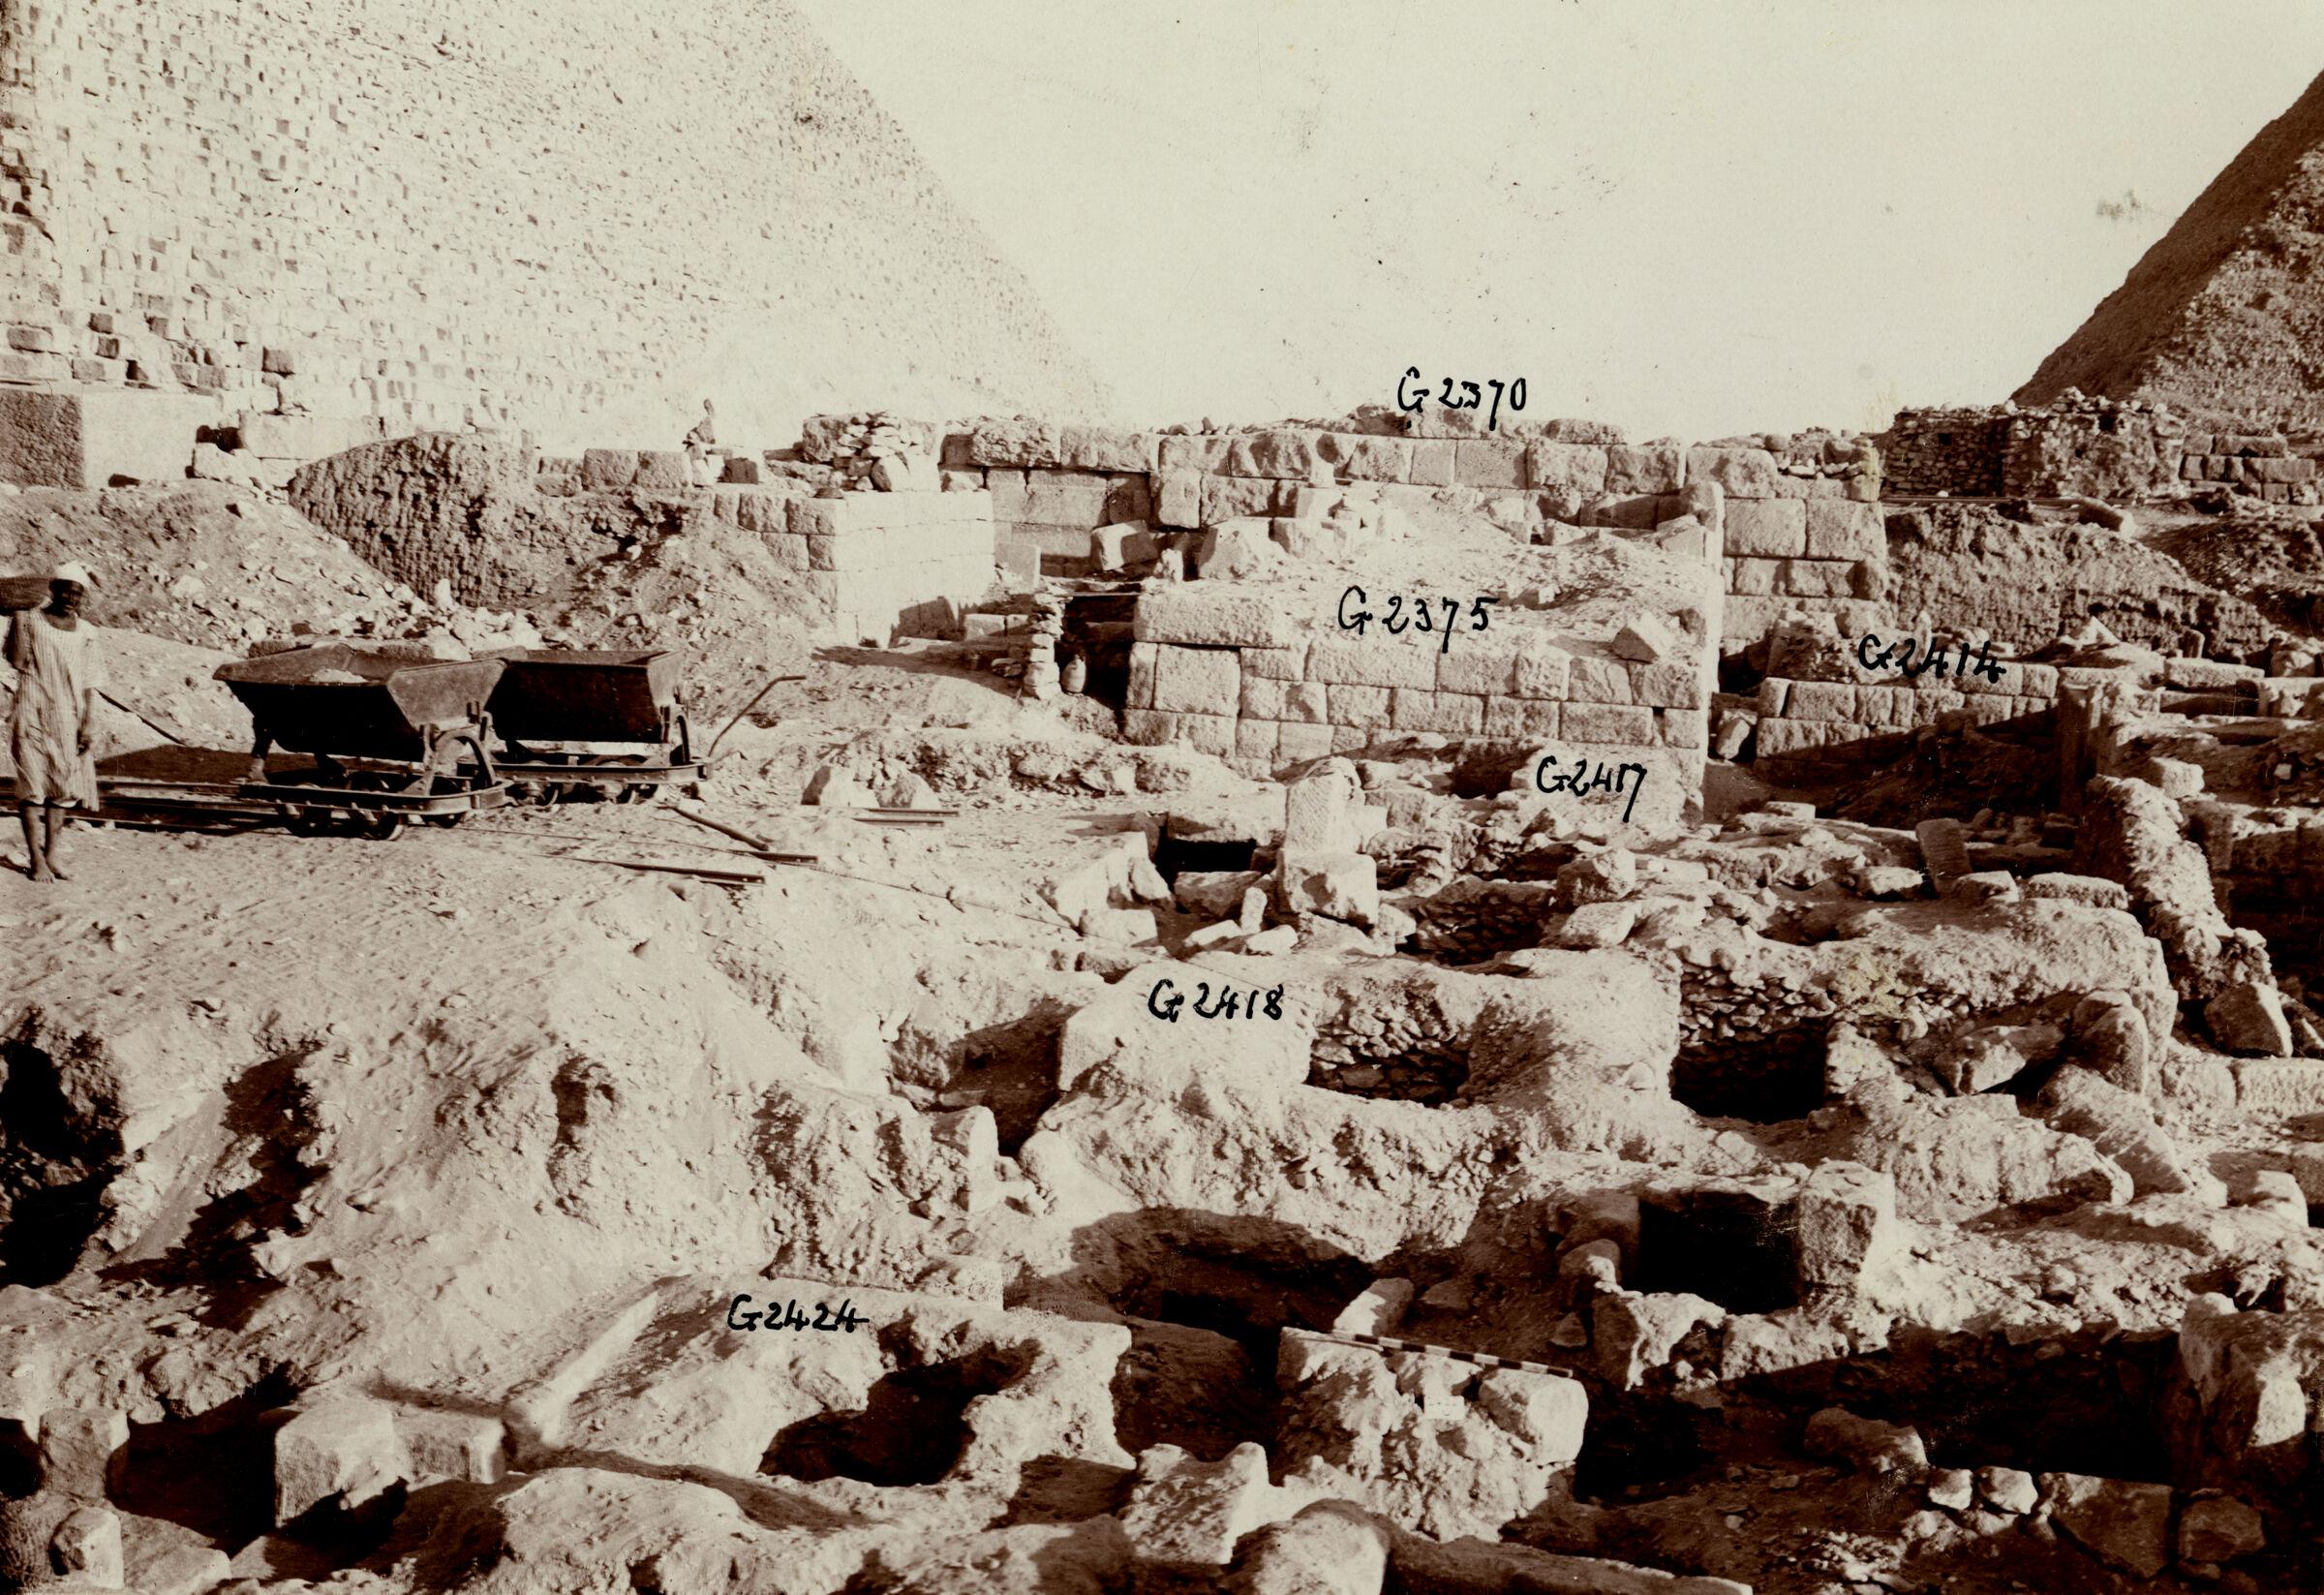 Western Cemetery: Site: Giza; View: G 2424+2425, G 2418, G 2417, G 2375, G 2414, G 2370